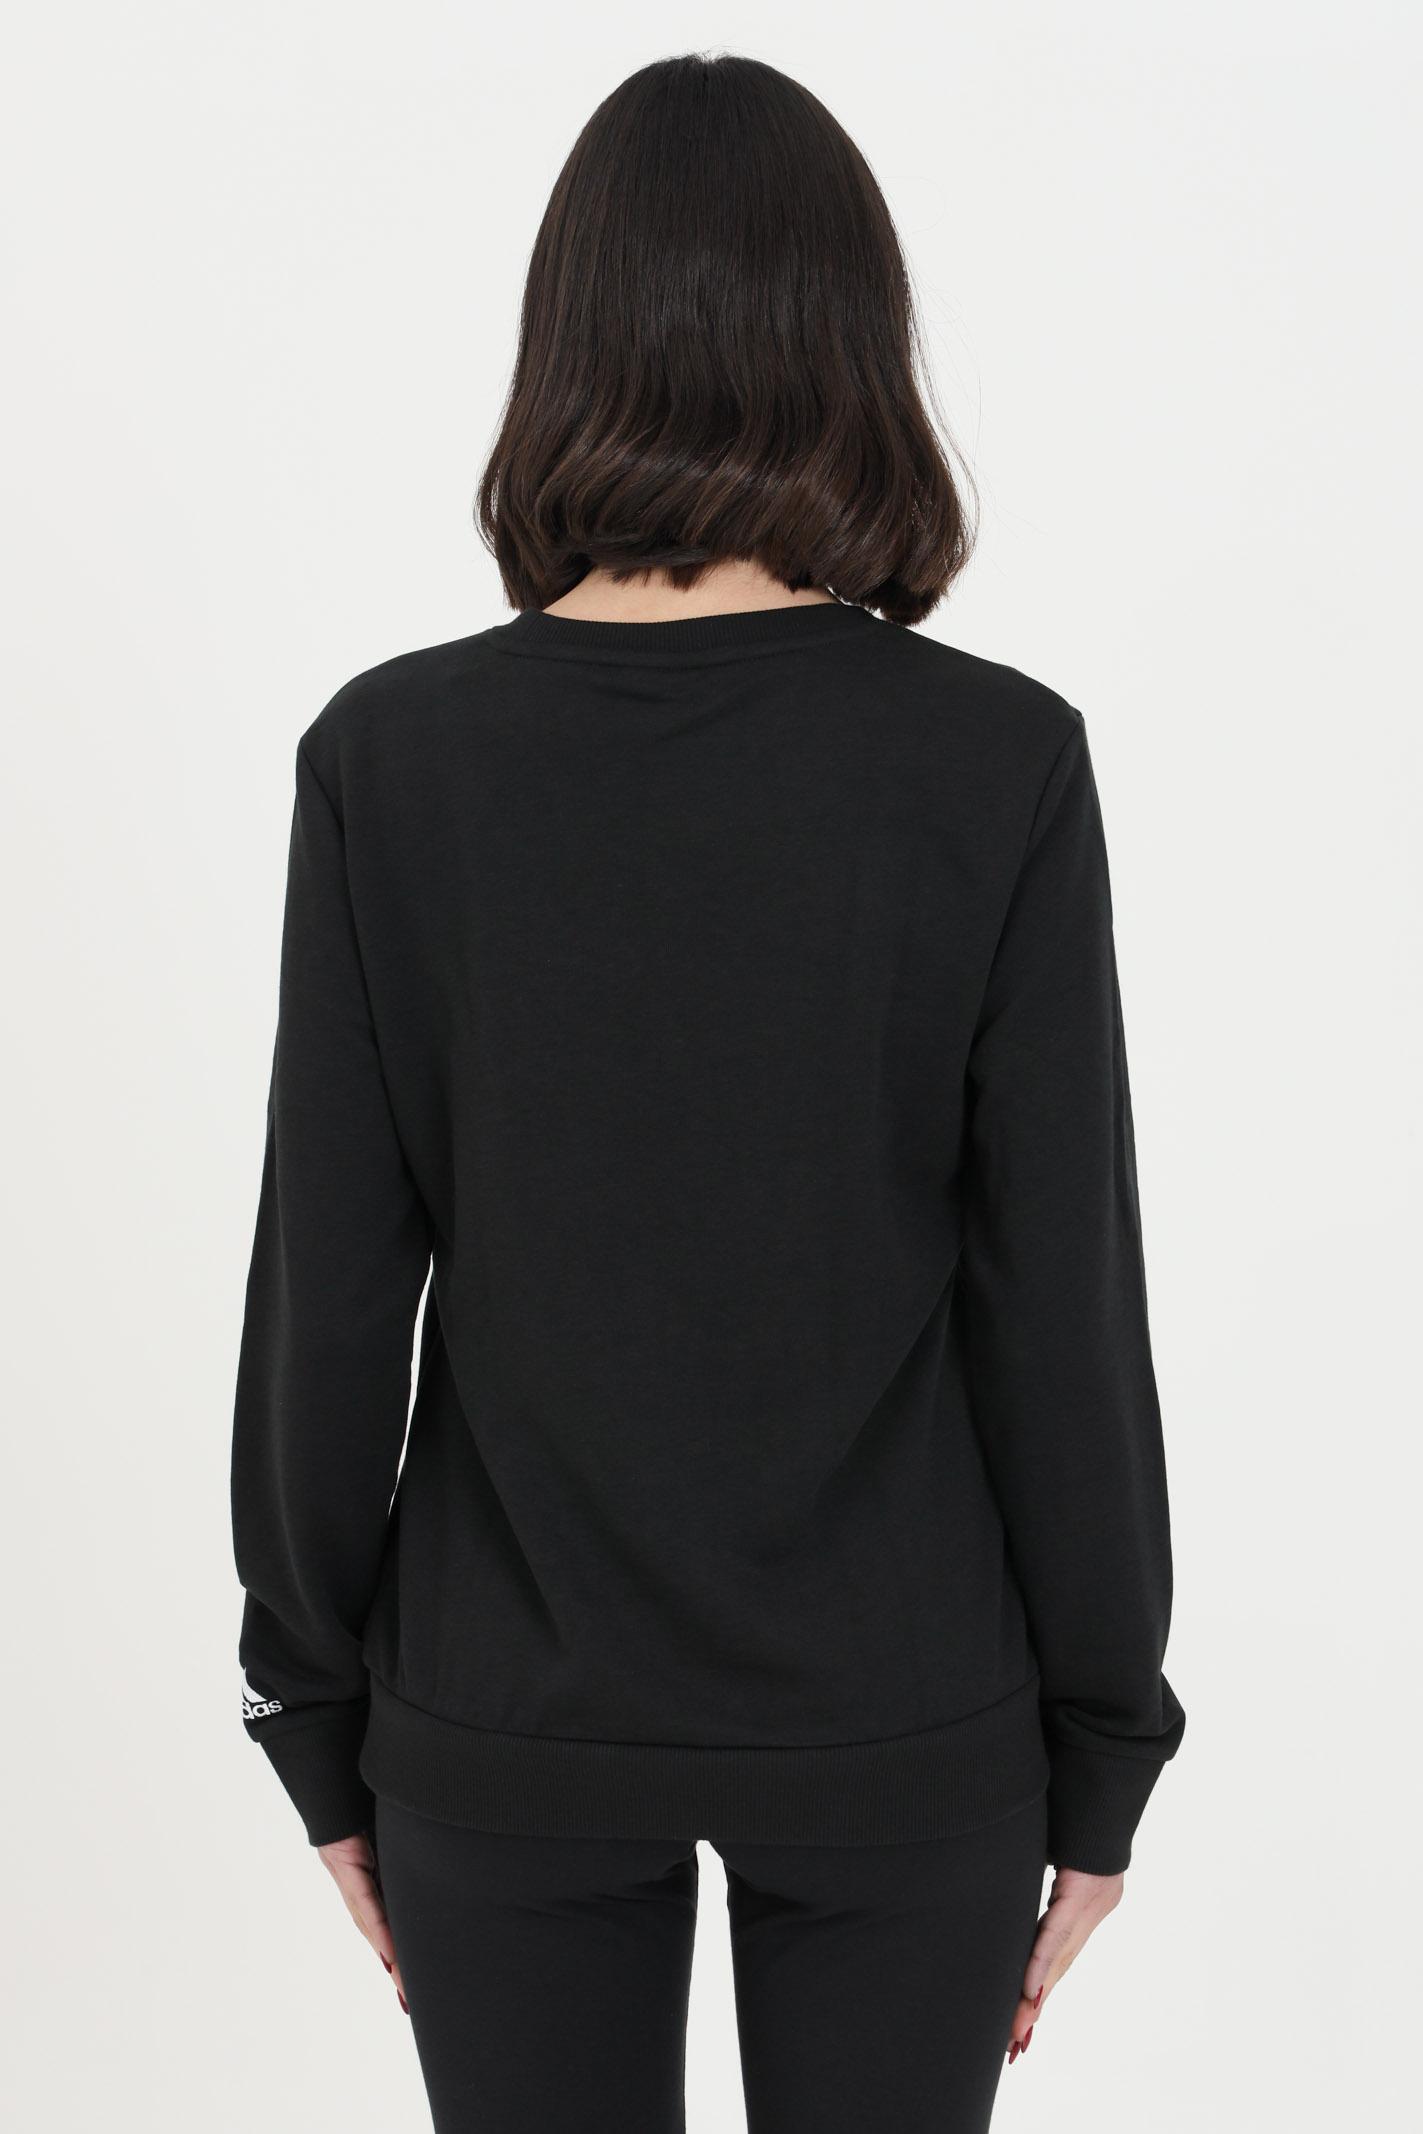 Adidas crewneck women's black sweatshirt ADIDAS   Sweatshirt   GL0718.